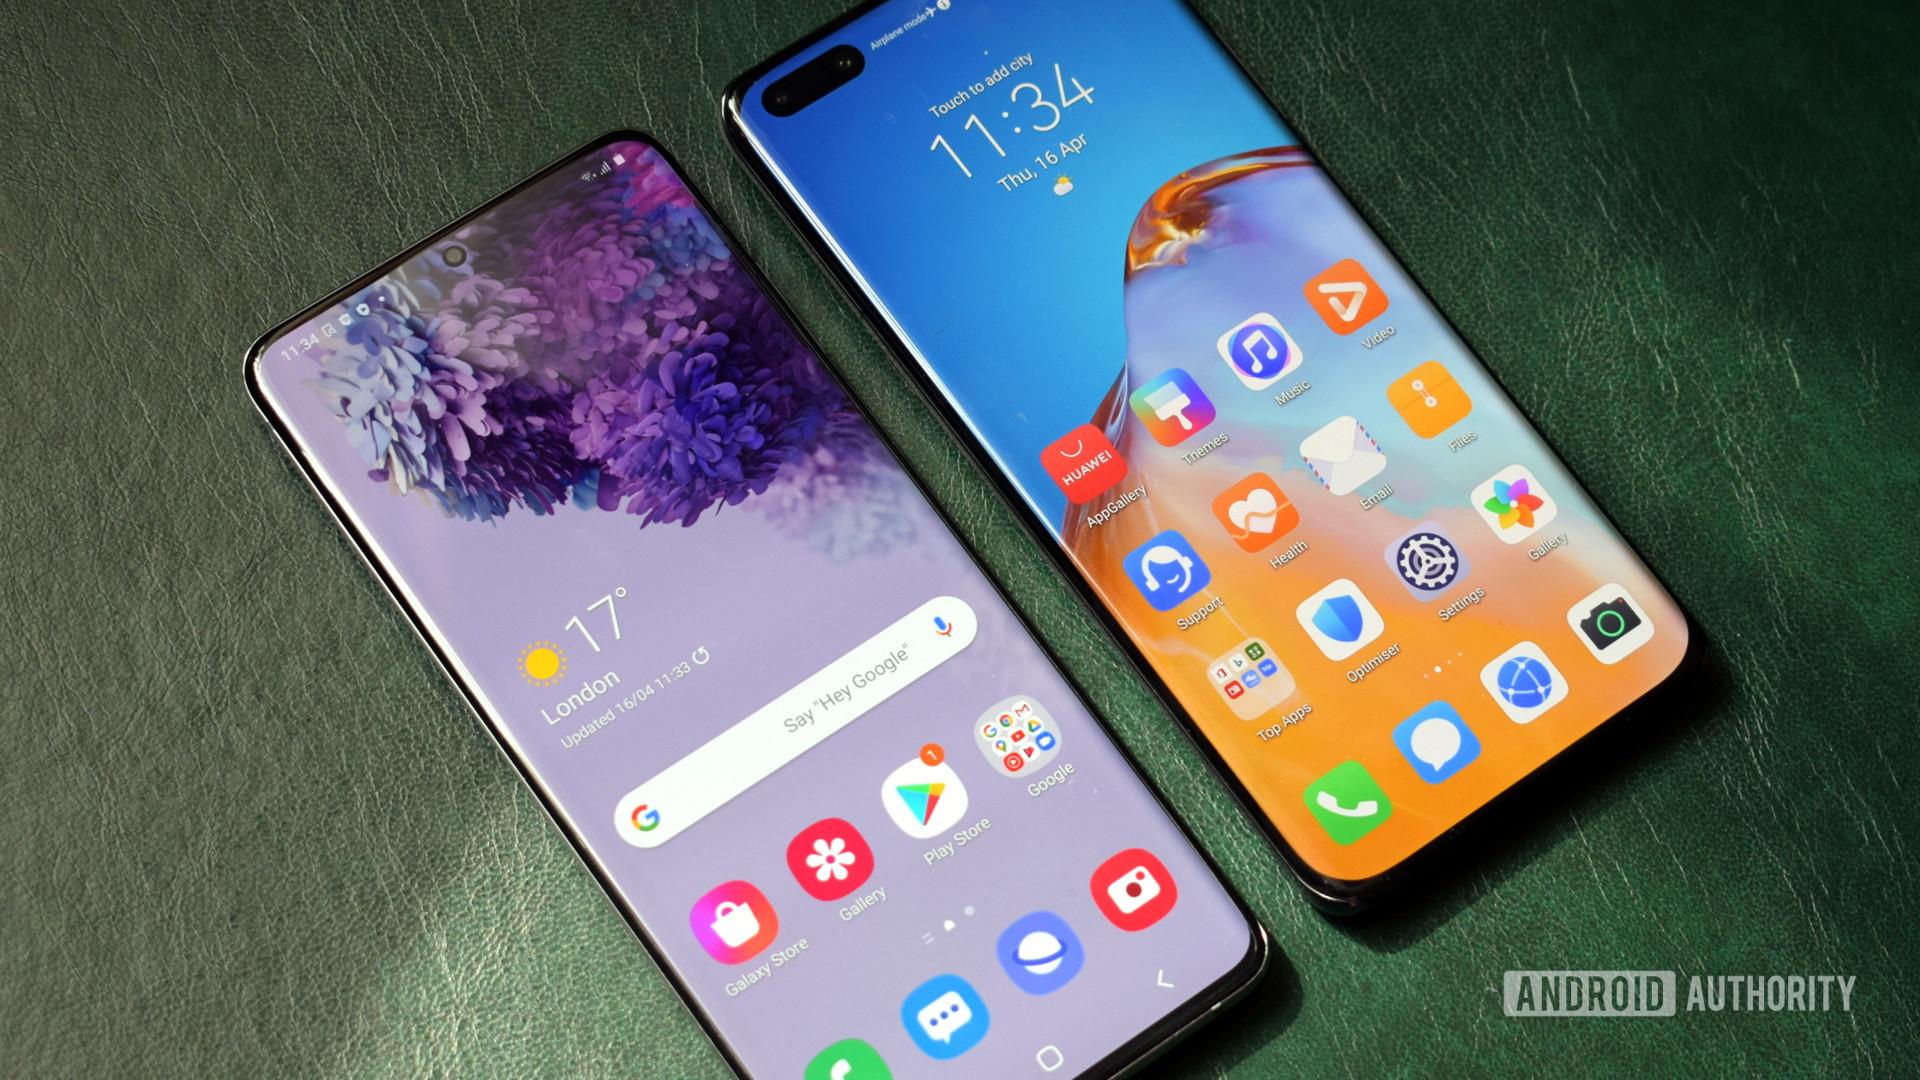 Samsung Galaxy S20 vs Huawei P40 Pro displays